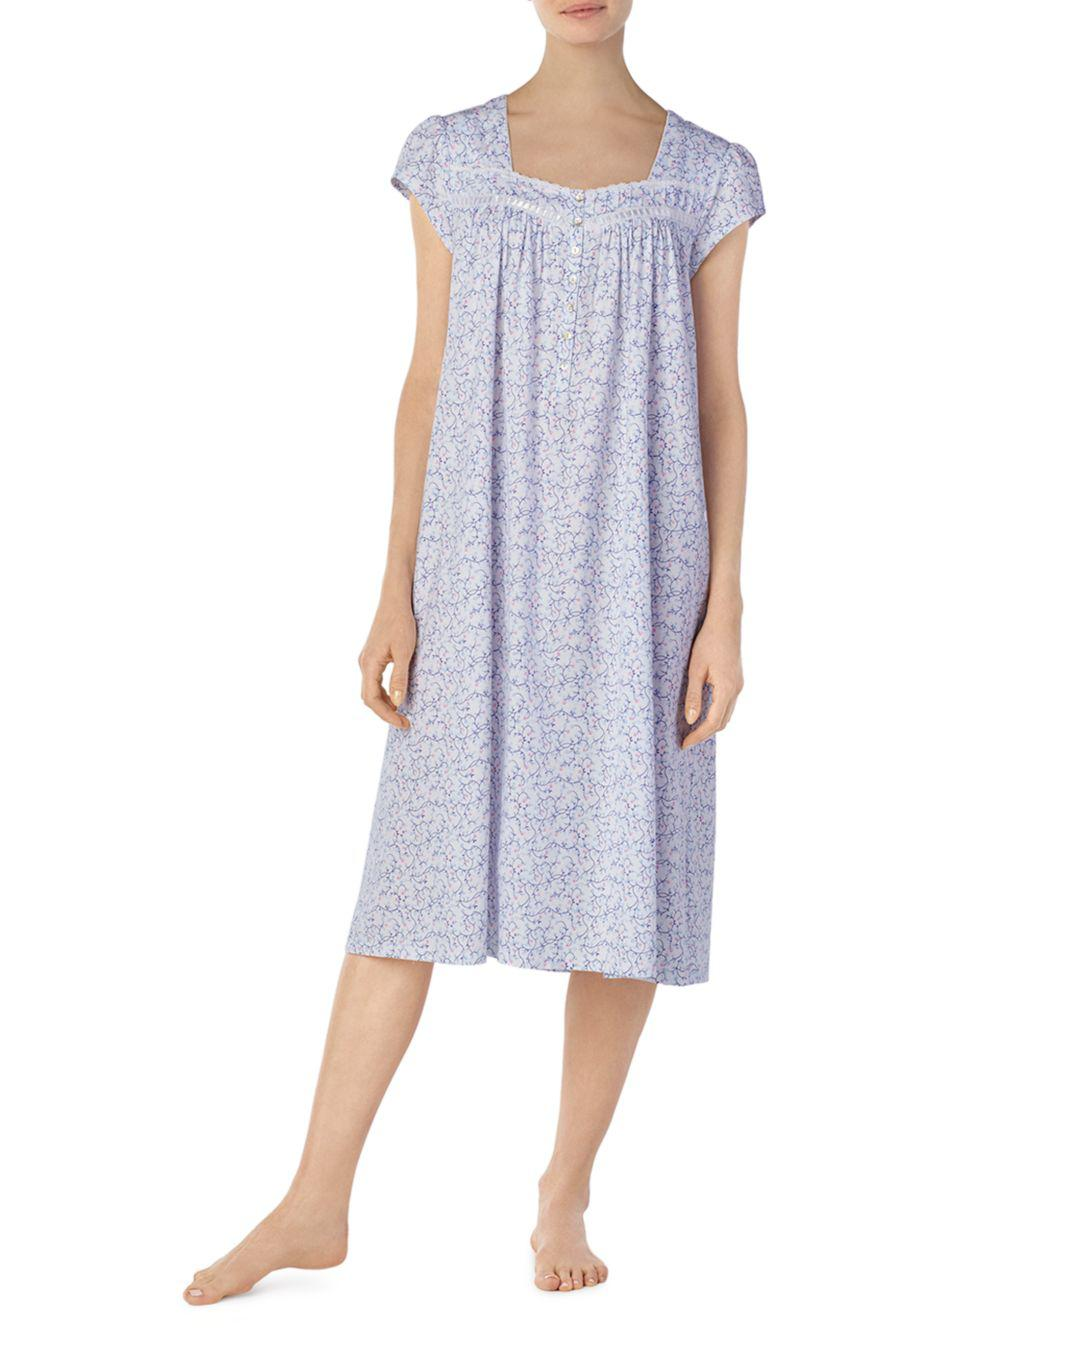 0081512d98 Lyst - Eileen West Cap Sleeve Ballet Nightgown in Blue - Save 43.75%